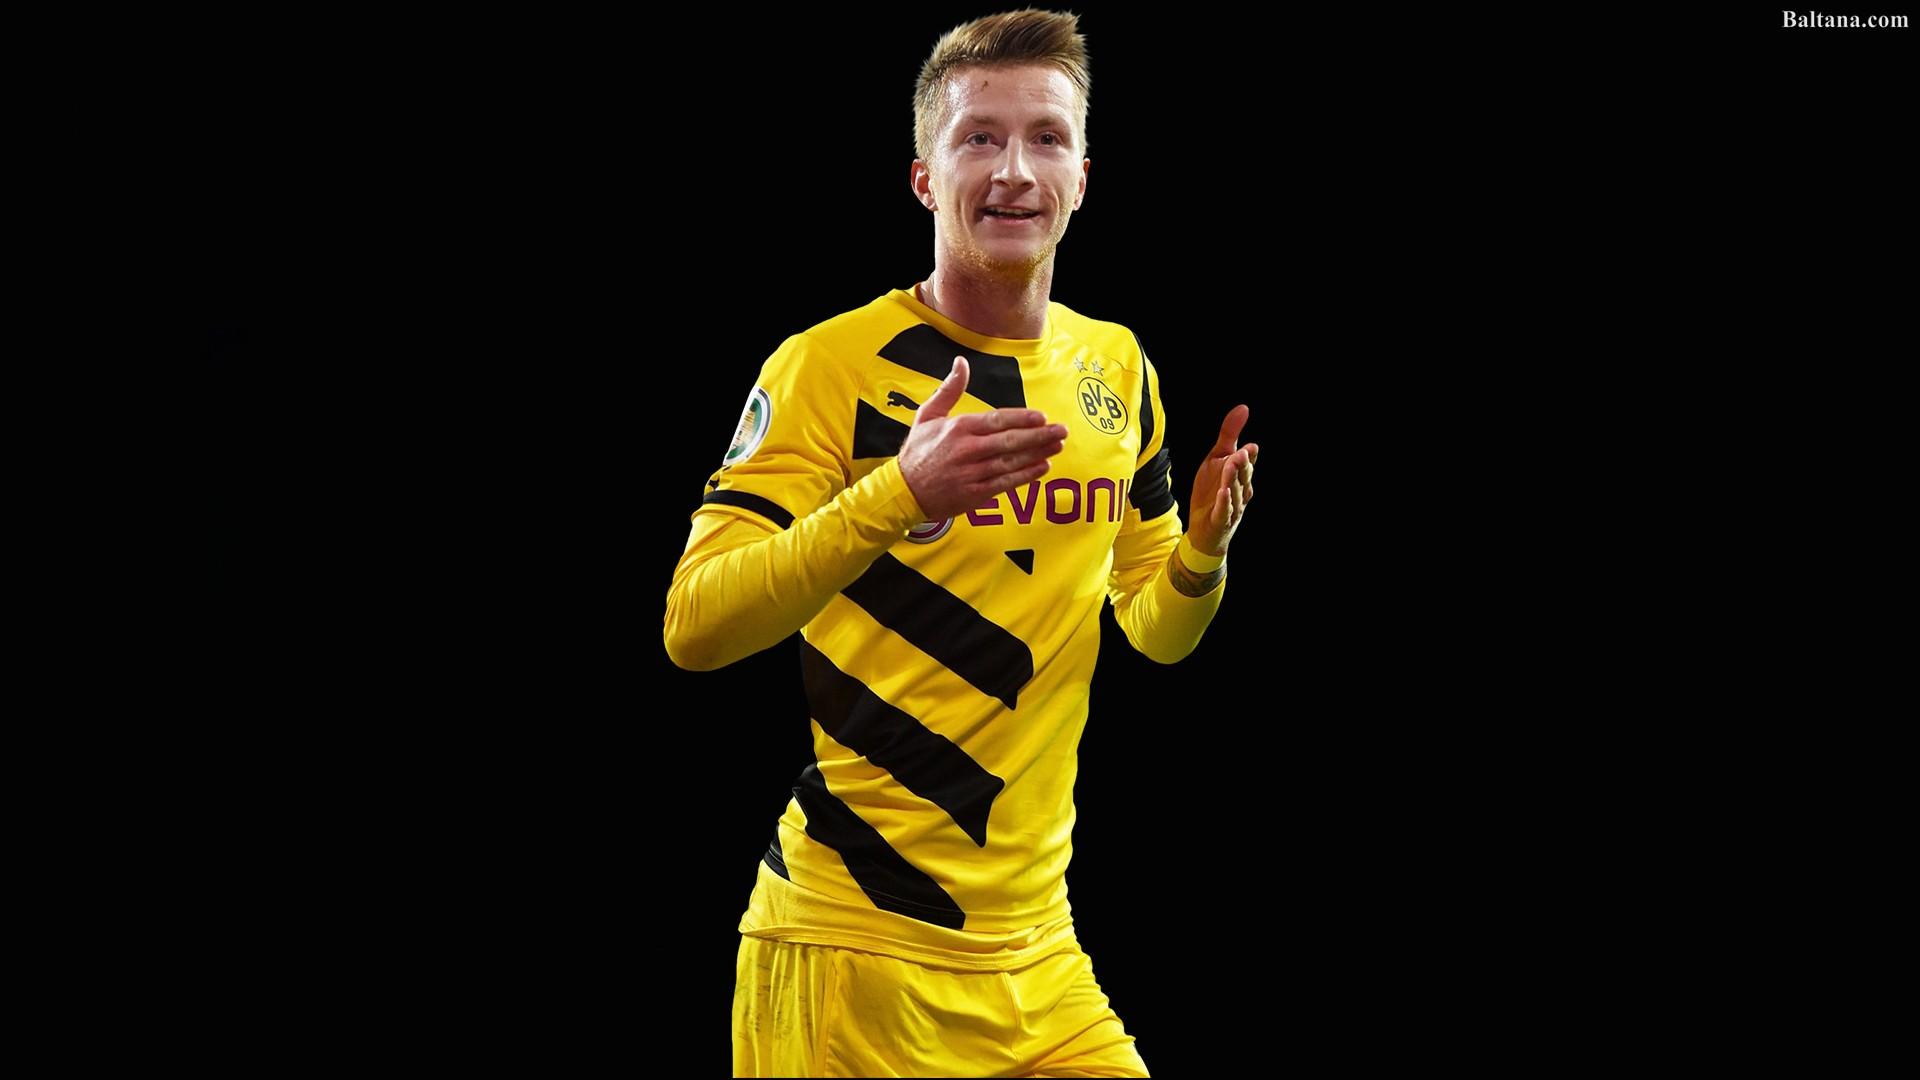 Borussia Dortmund Background Wallpaper 33900   Baltana 1920x1080